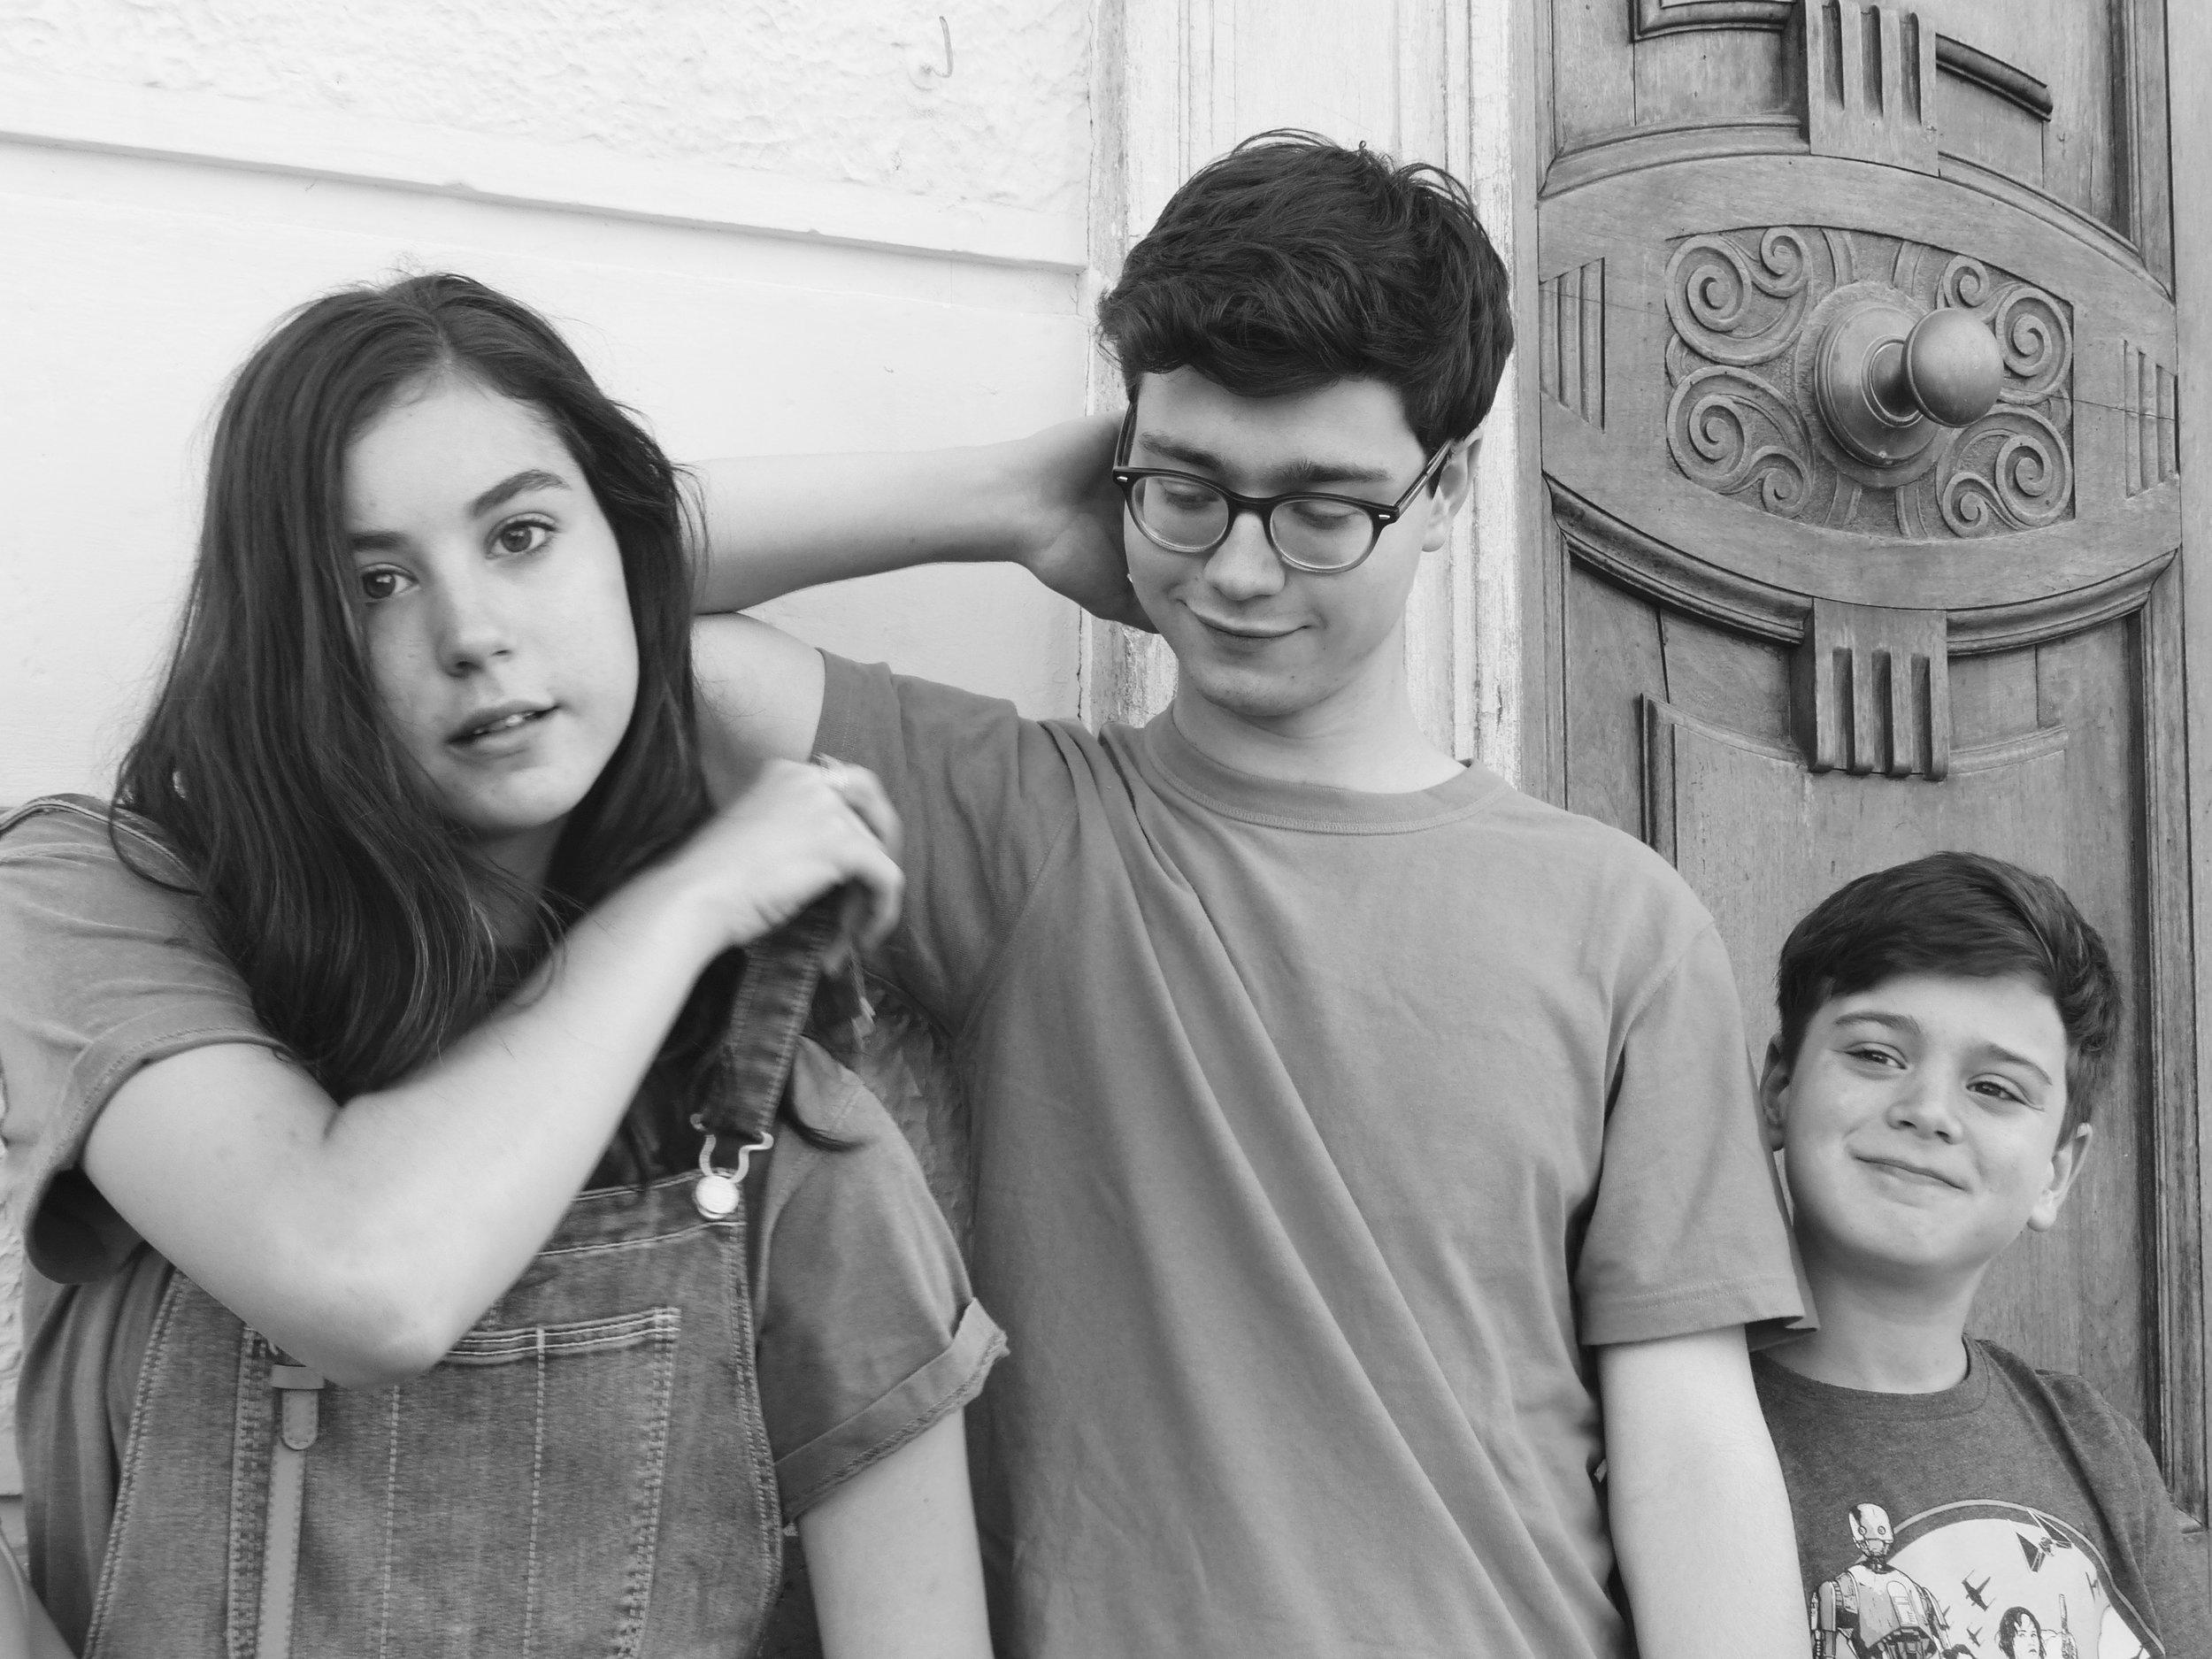 sulmona-kids-bandw.jpg